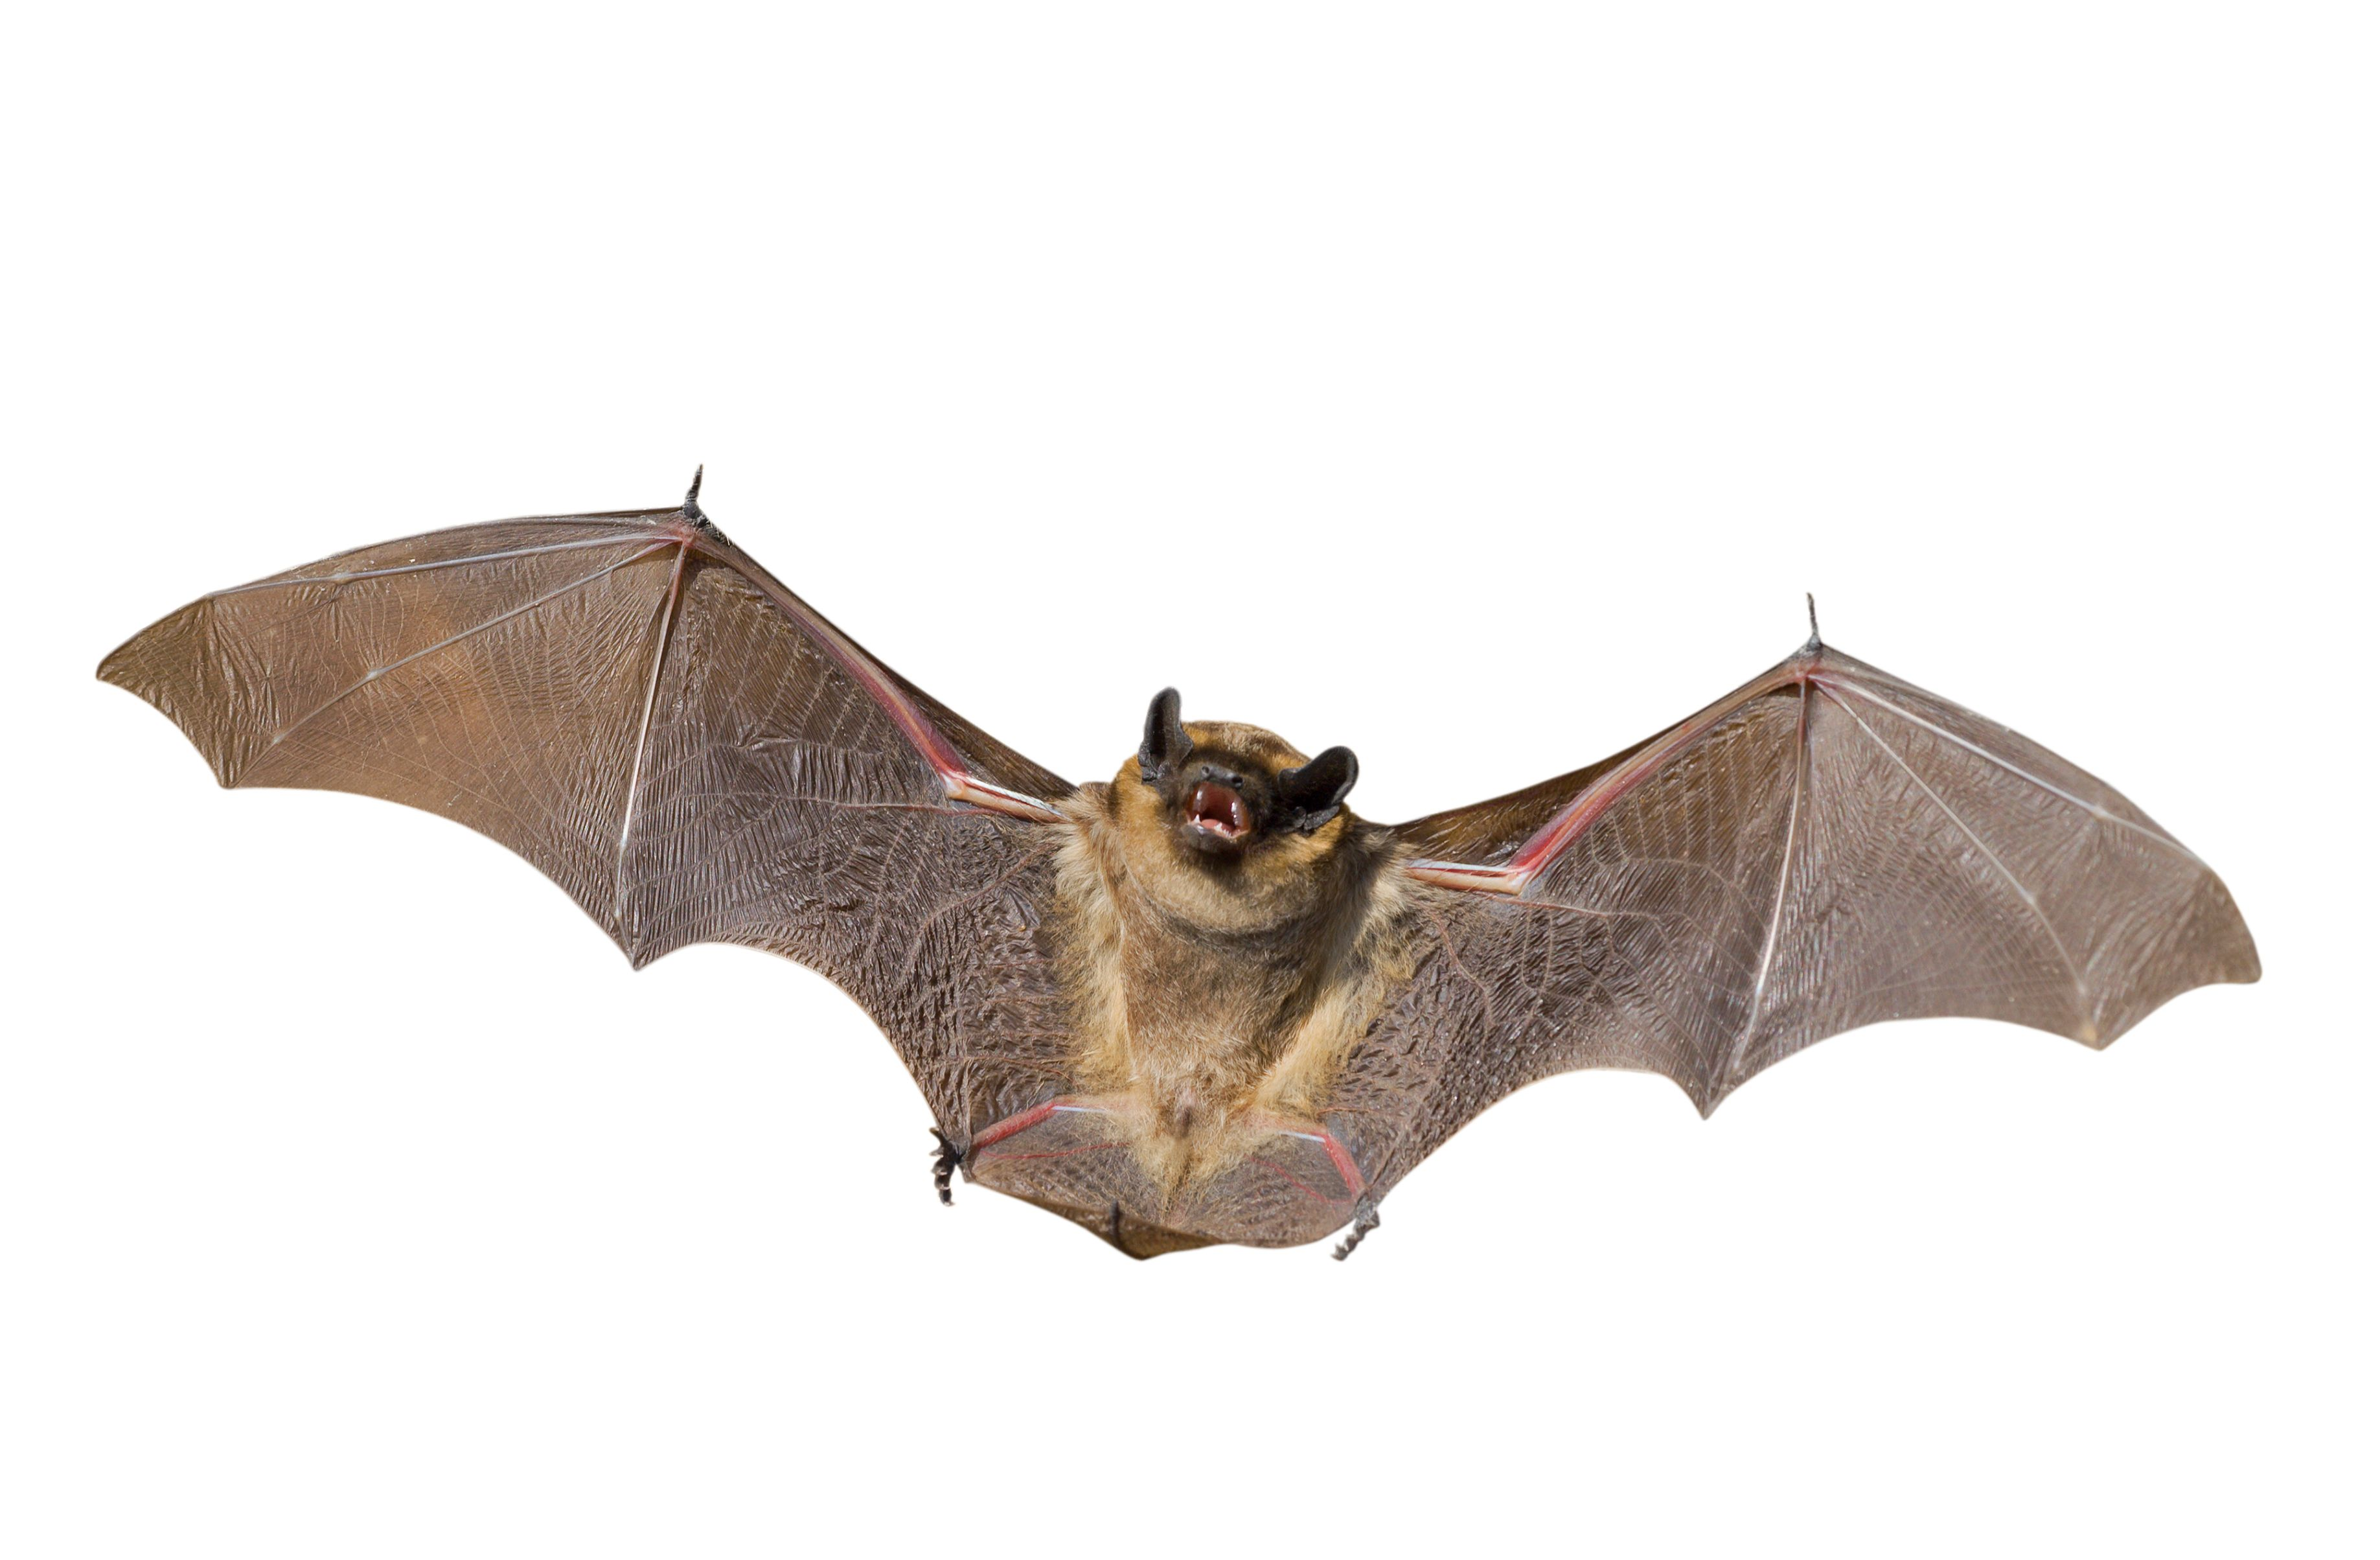 bats  Google Search  photos  Pinterest  Search Bats and